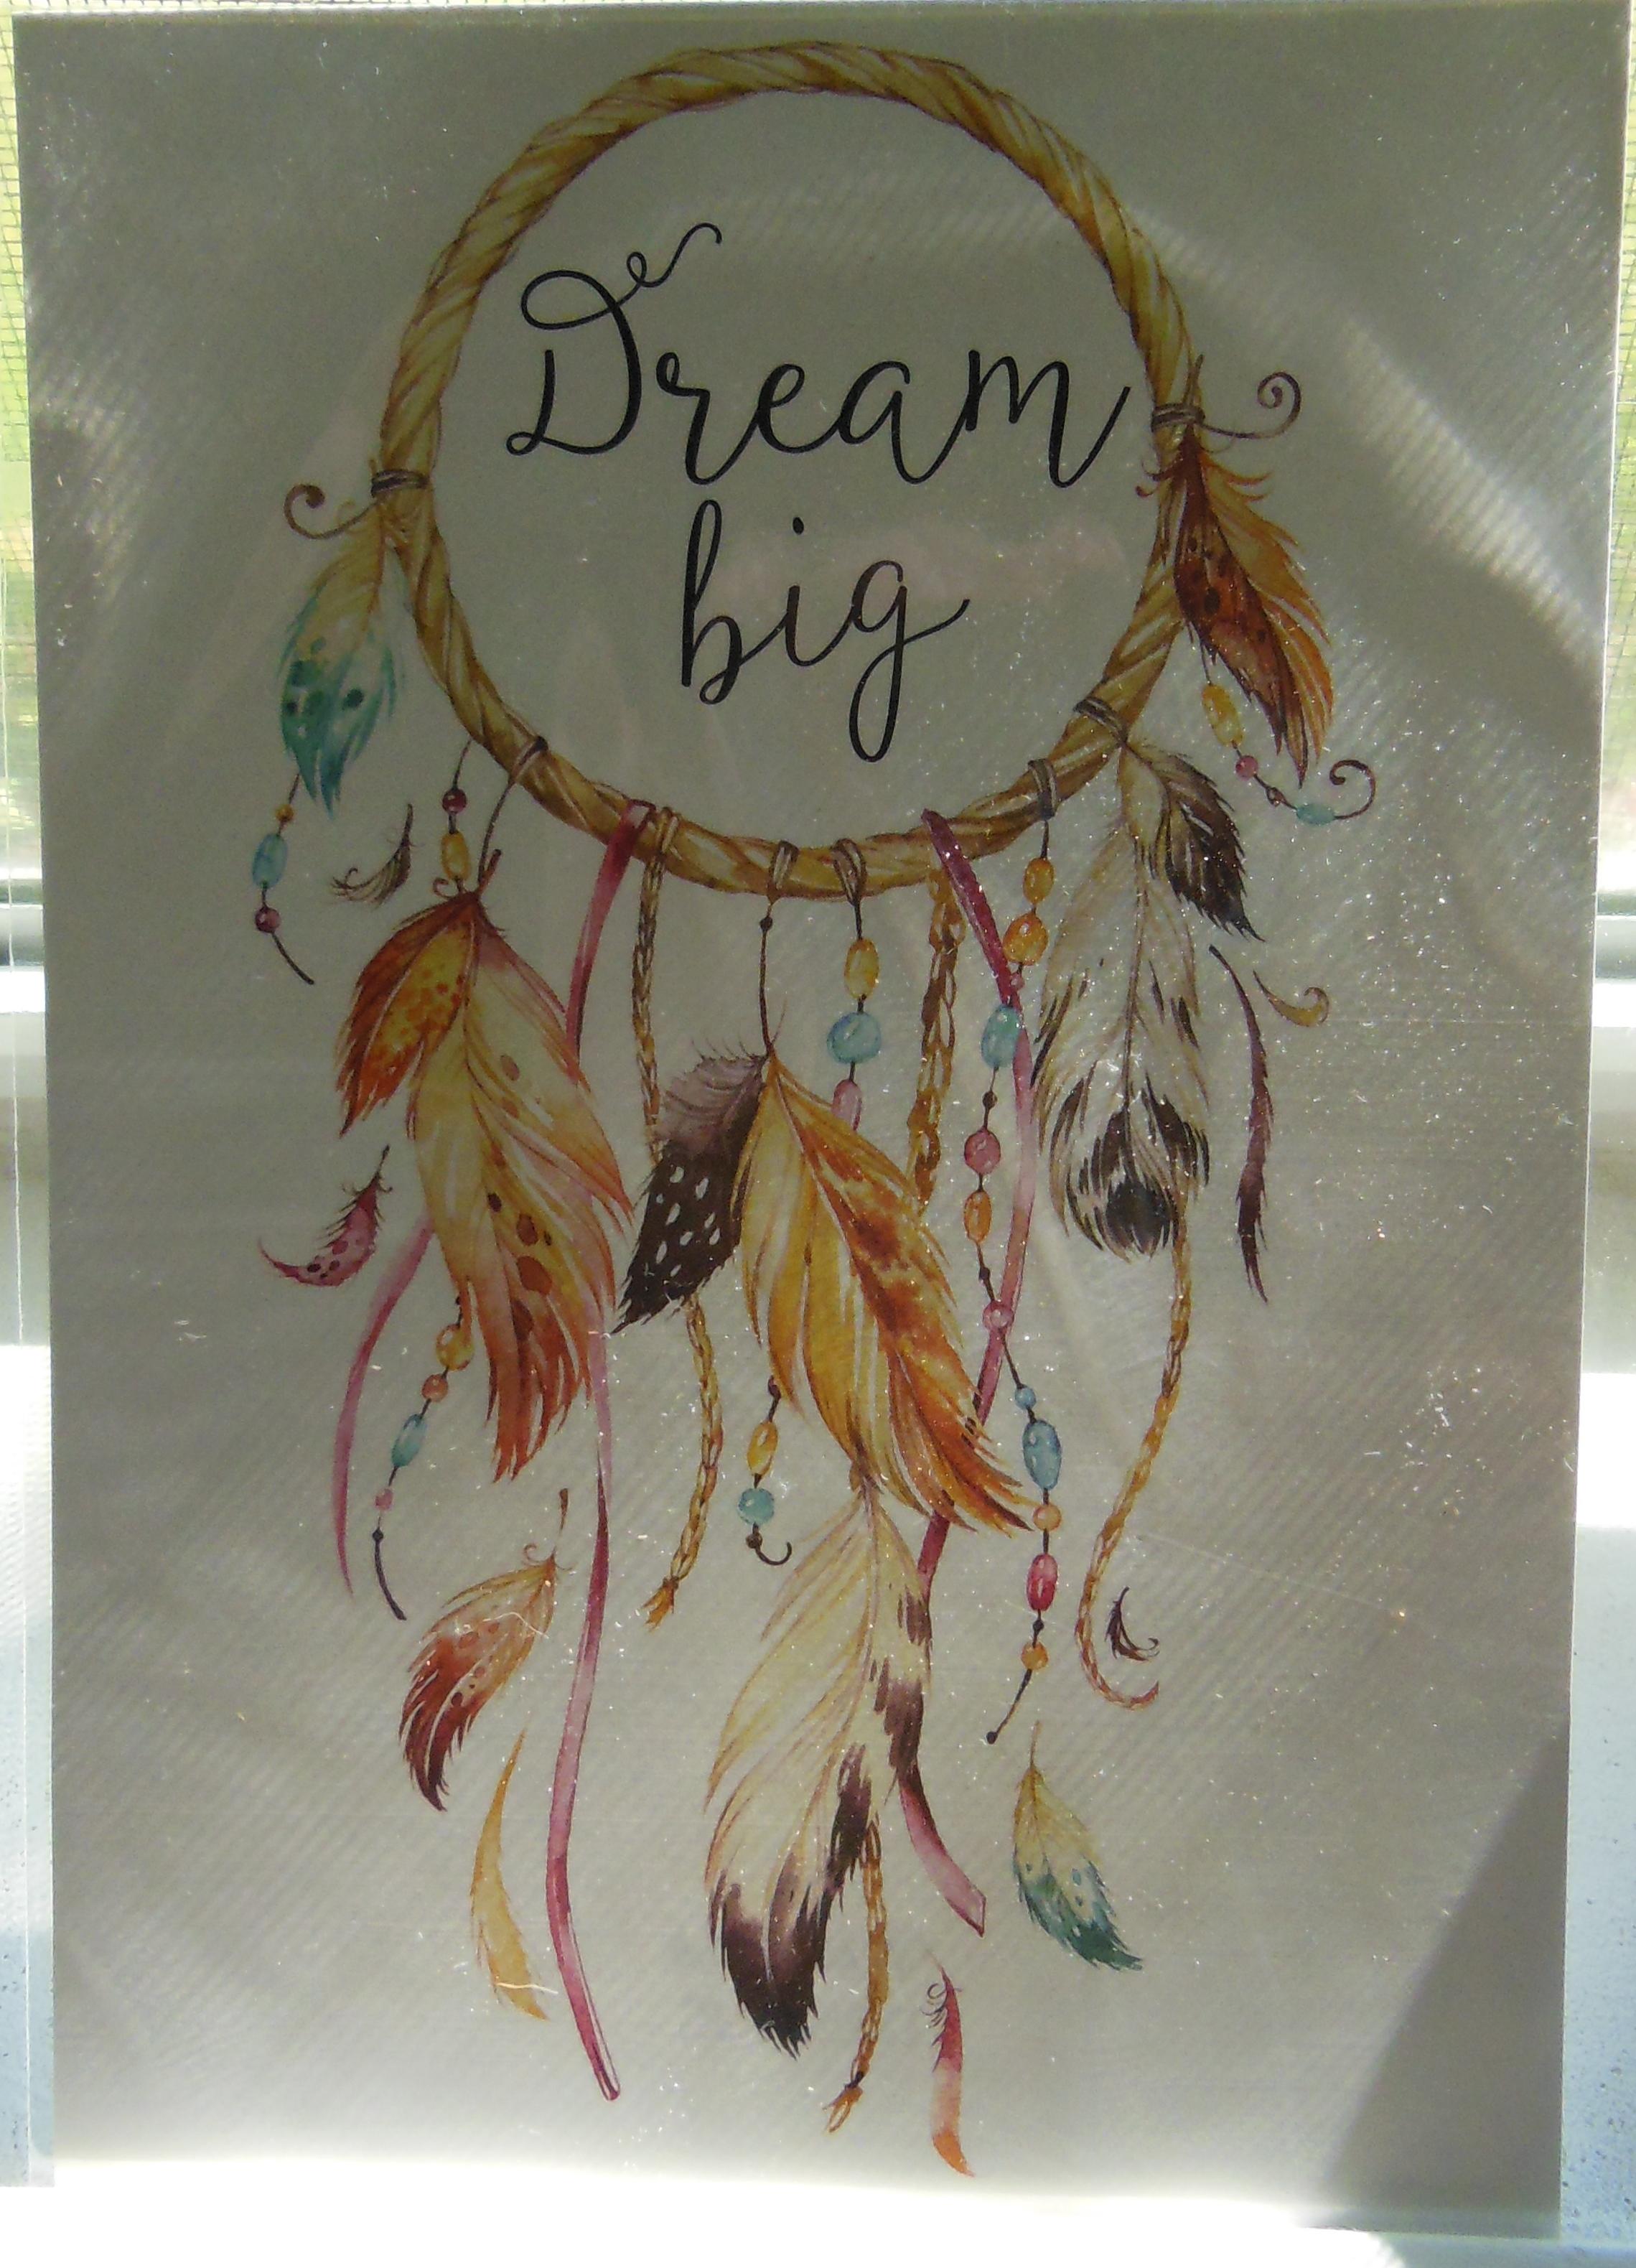 DREAM BIG 5X7 PRINT RV $9